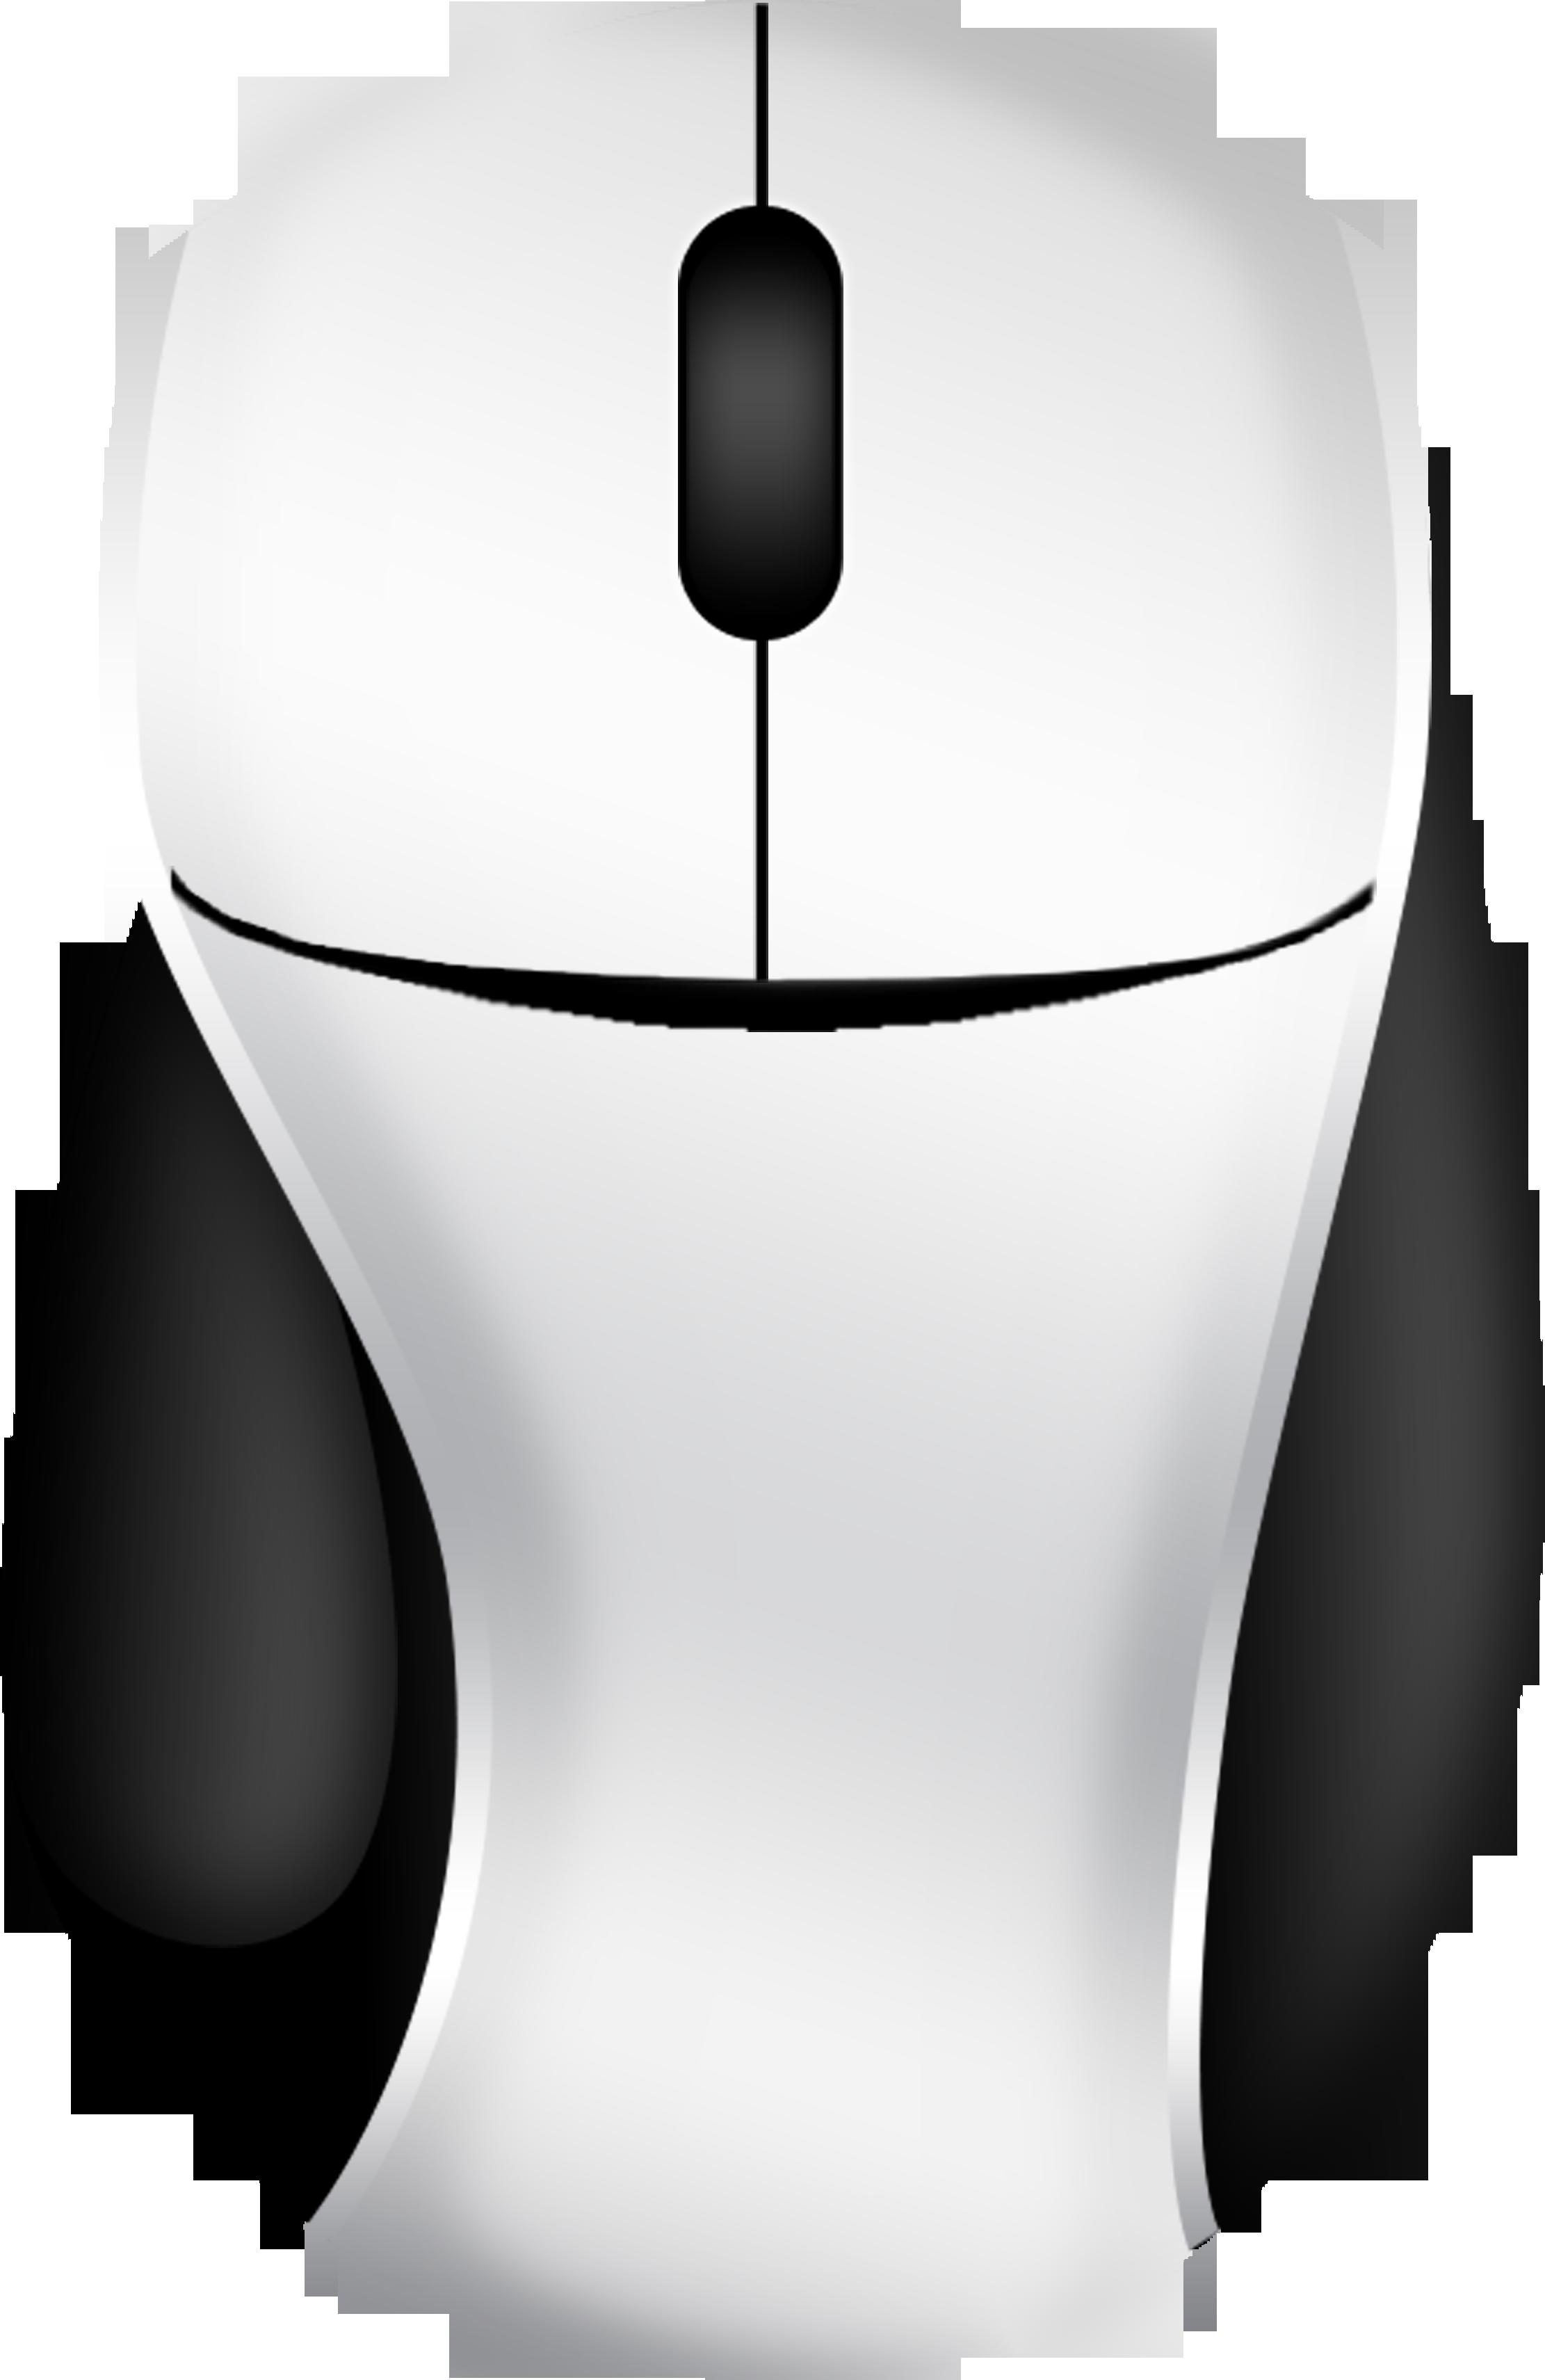 Website clipart computer mouse. Pc png image purepng